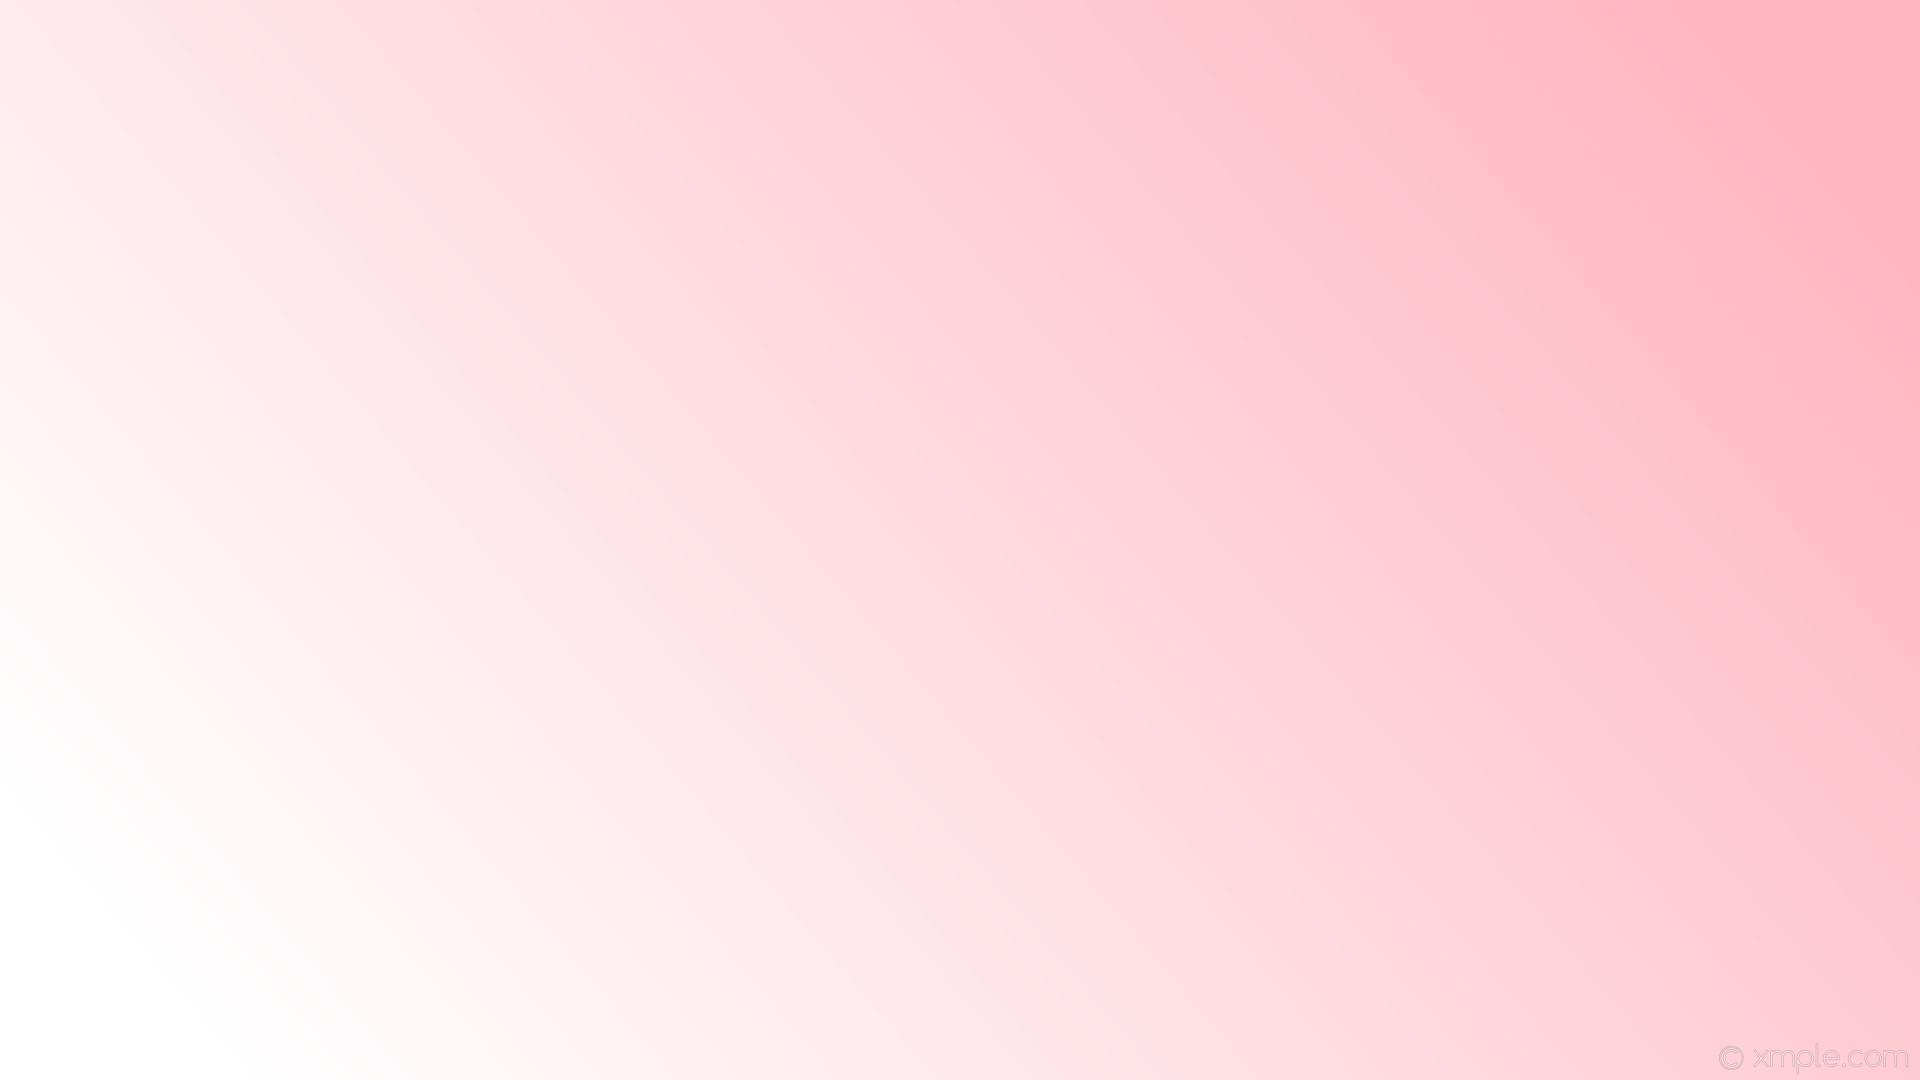 Res: 1920x1080, wallpaper pink gradient white linear light pink #ffb6c1 #ffffff 15°